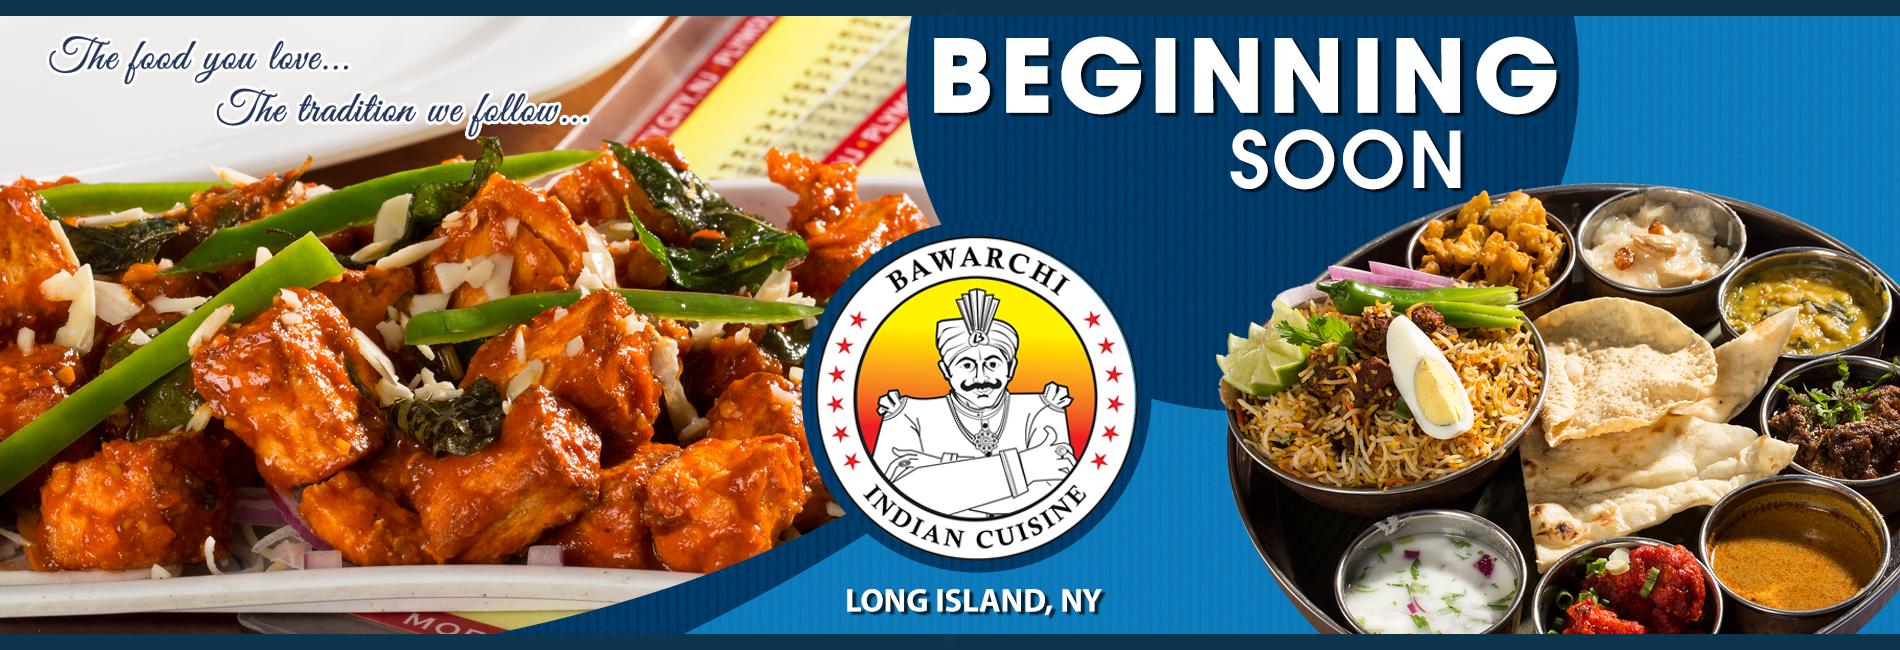 Bawarchi Biryanis, Long Island, NY - Opening Soon